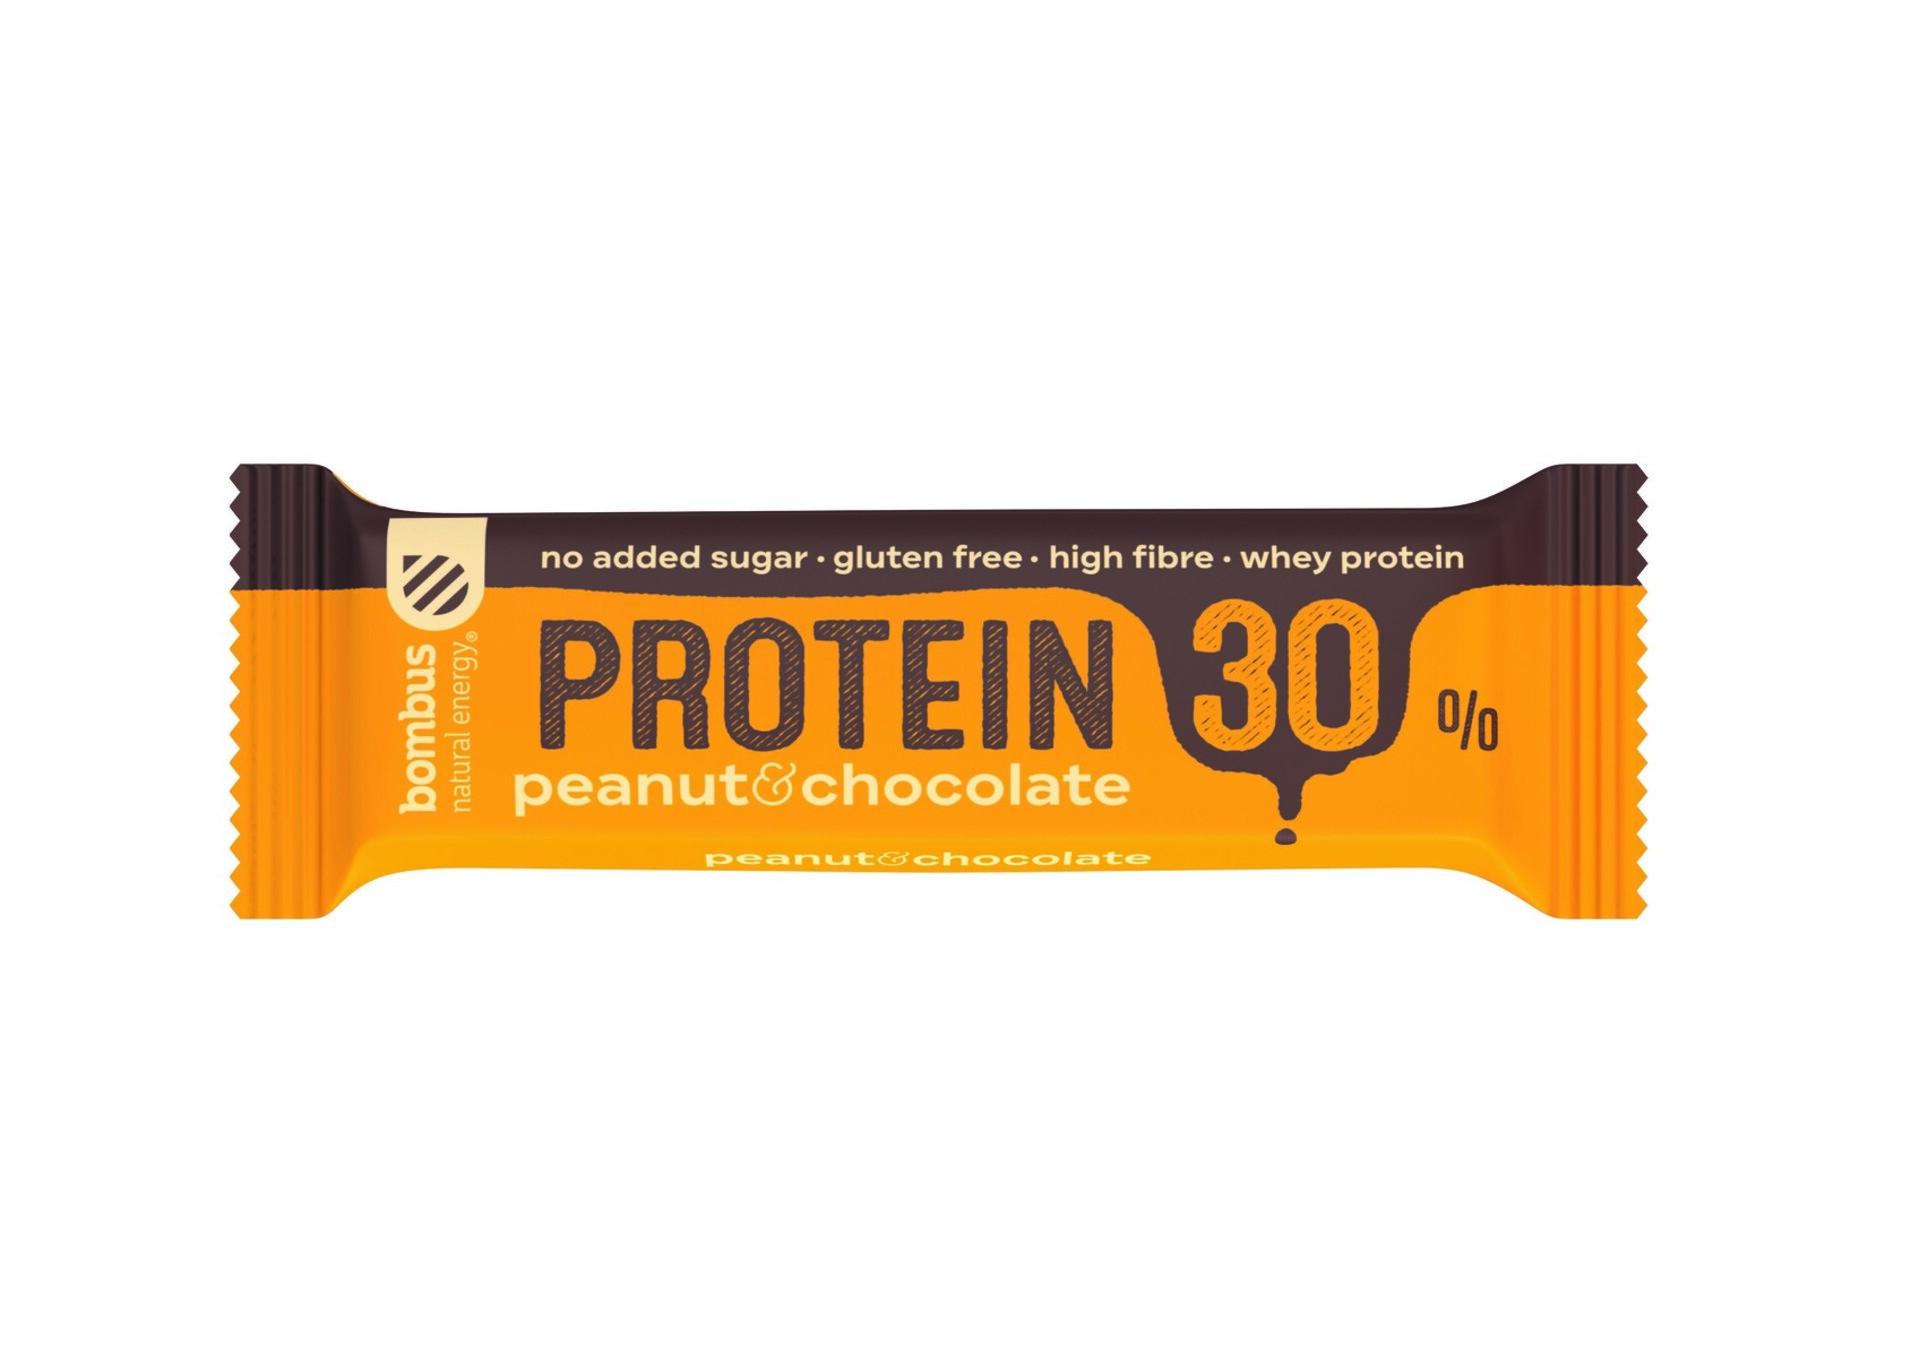 Bombus Proteín 30% Peanut a chocolate 50 g